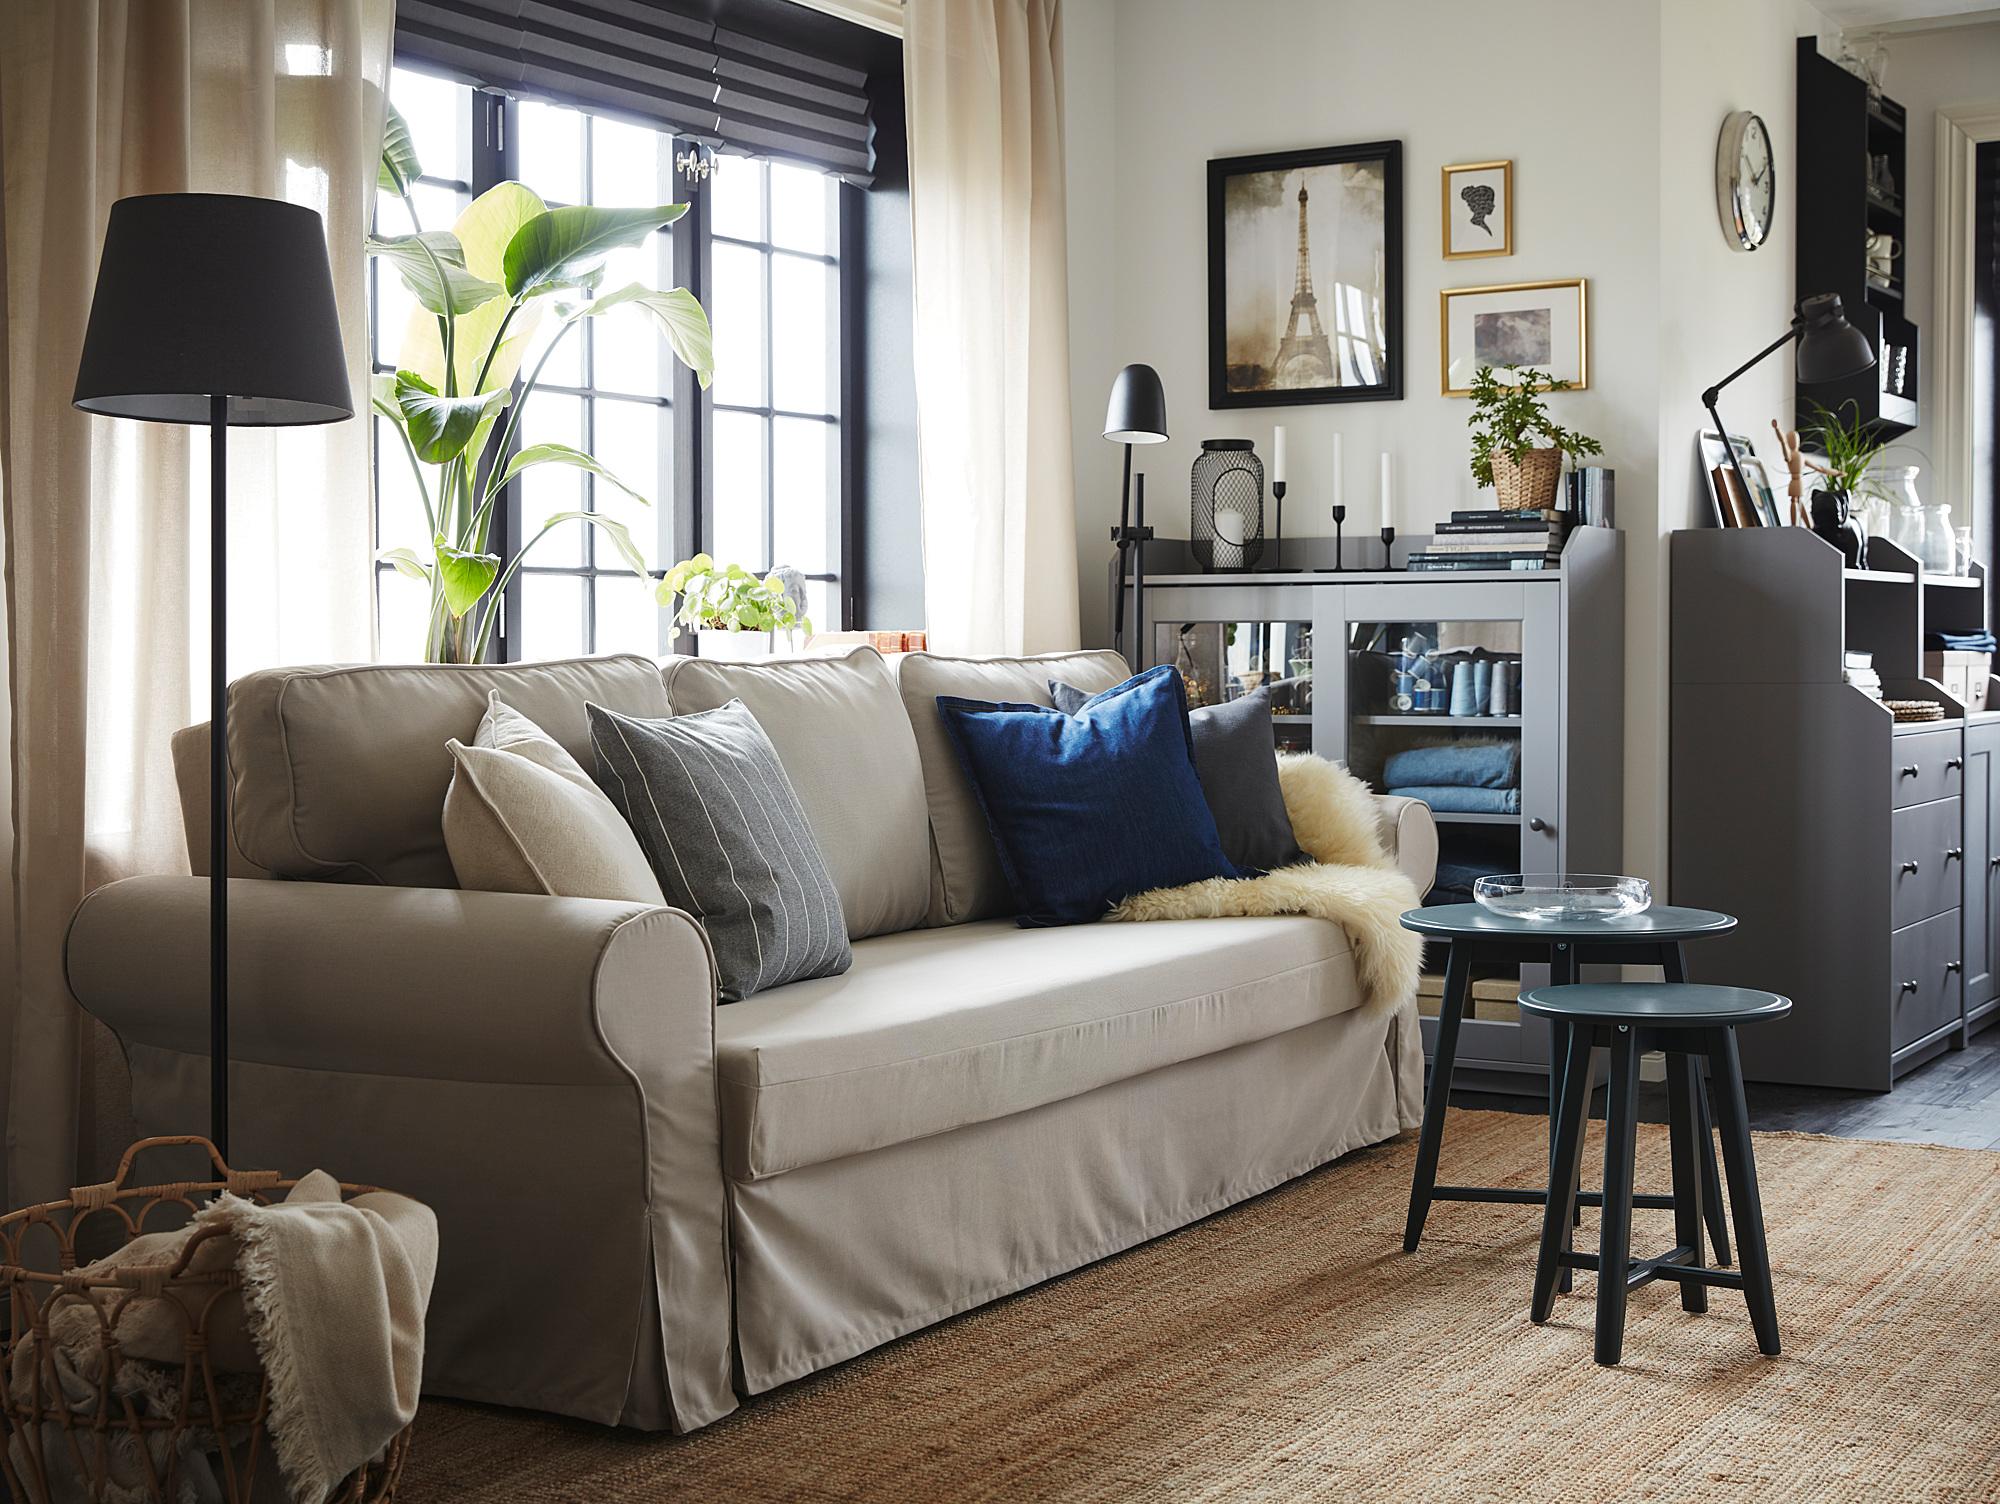 VRETSTORP 3 seat sofa bed, Totebo light beige   IKEA Indonesia